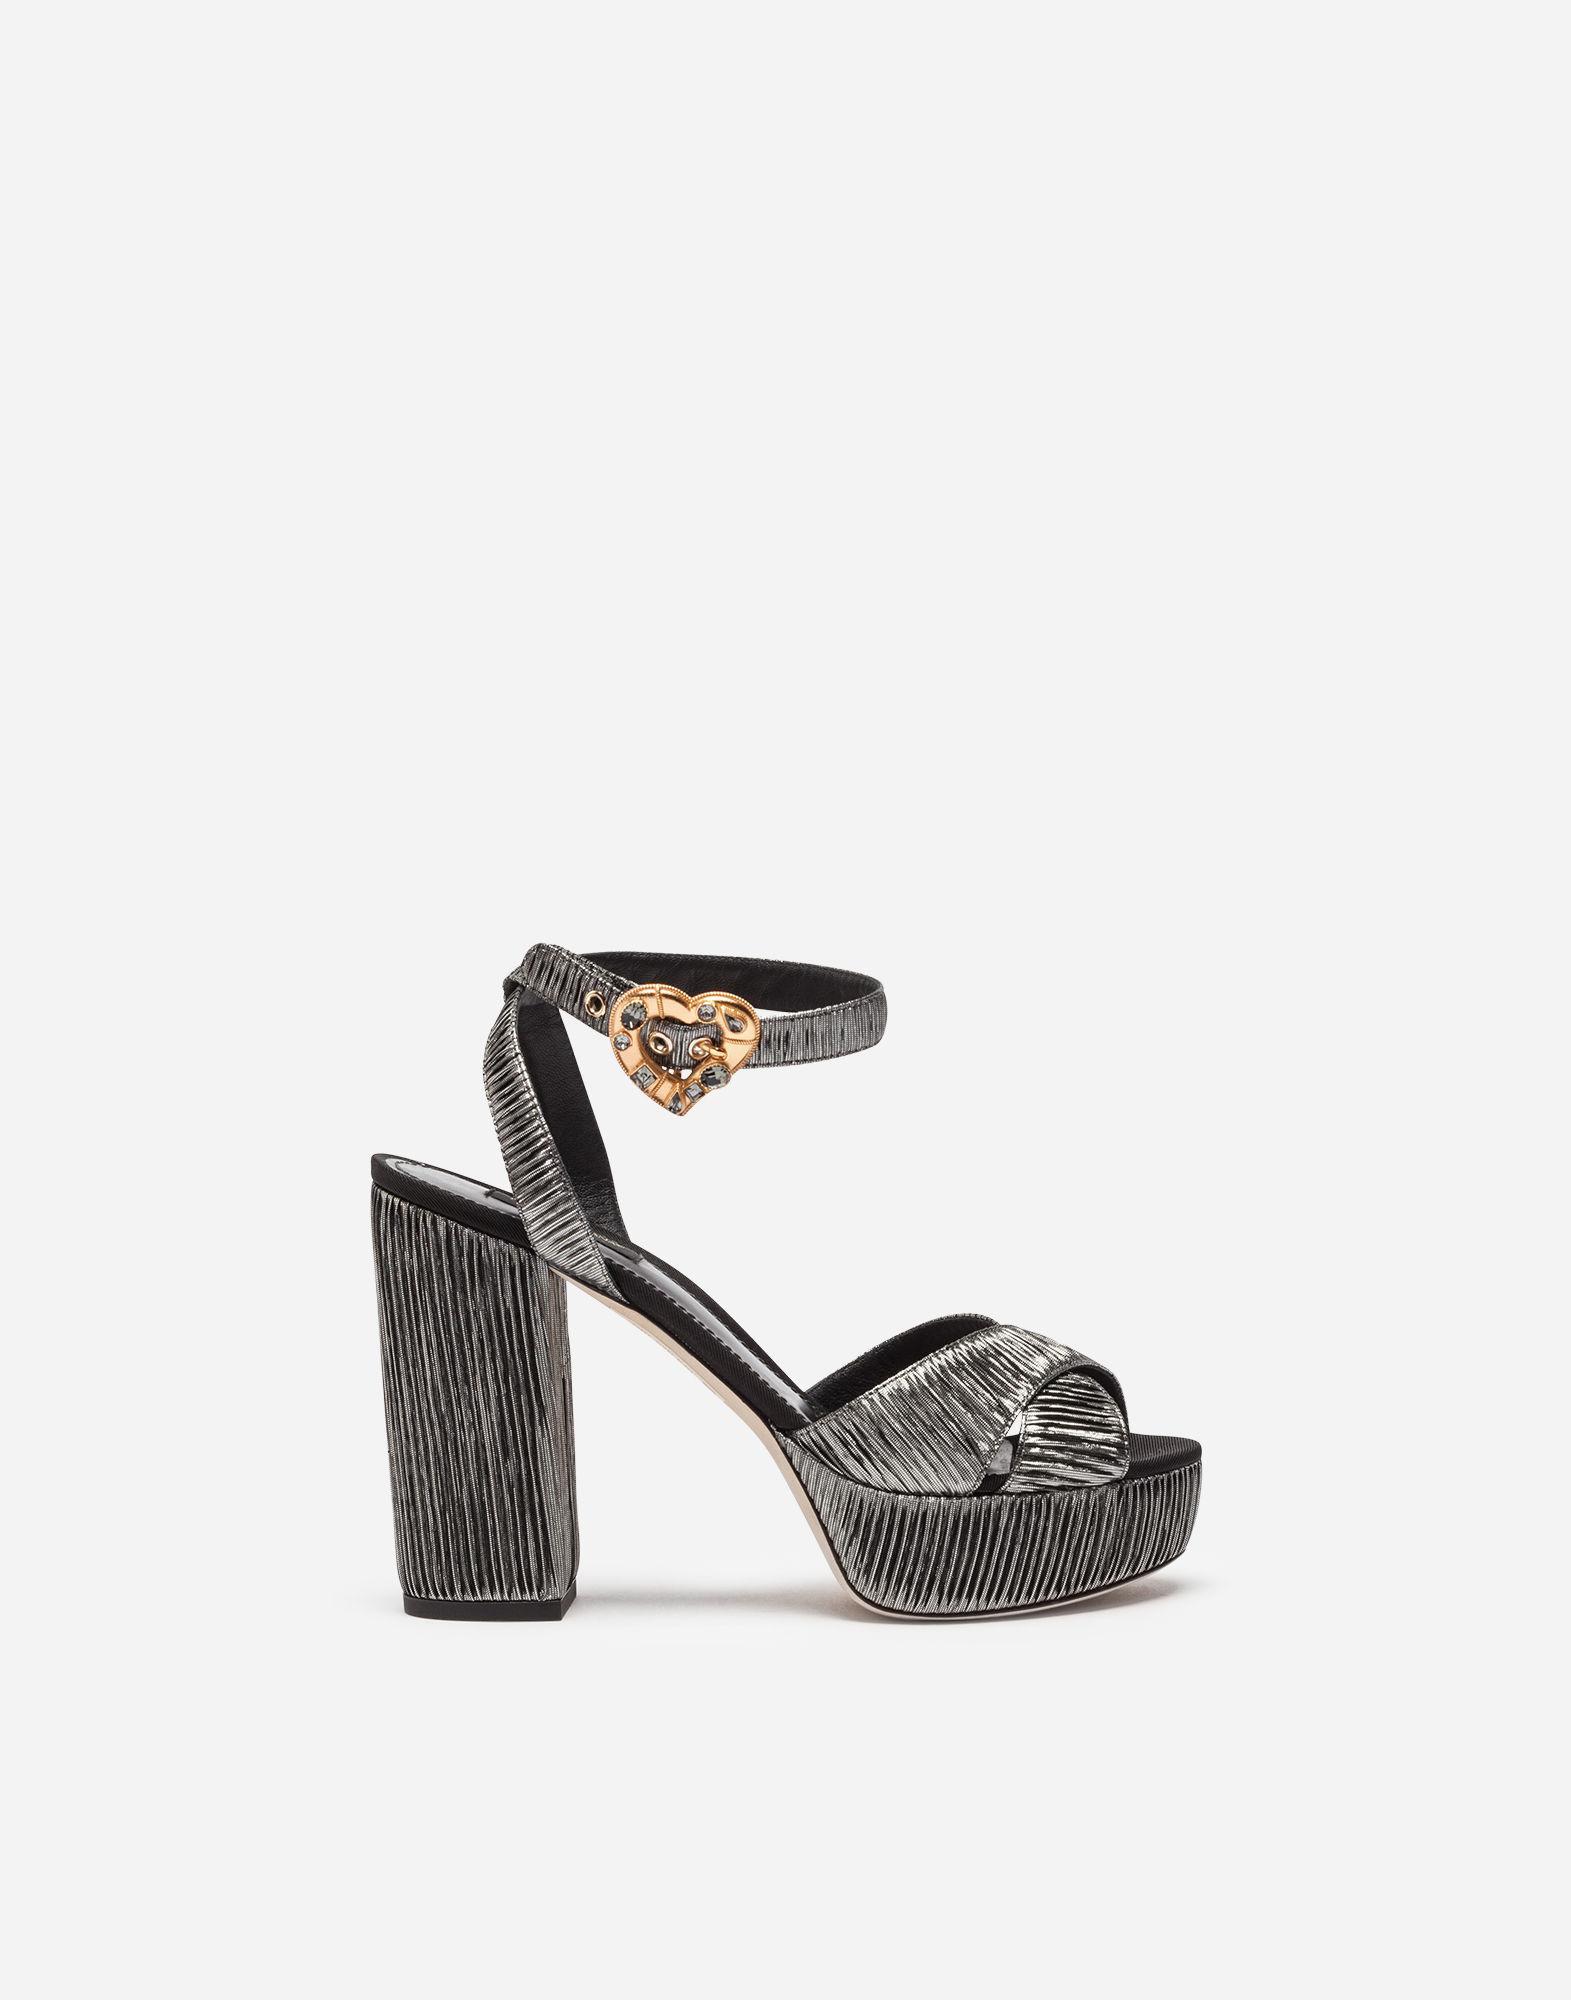 Dolce & Gabbana Silver Mira Pearl Sandals tV1J5o1c